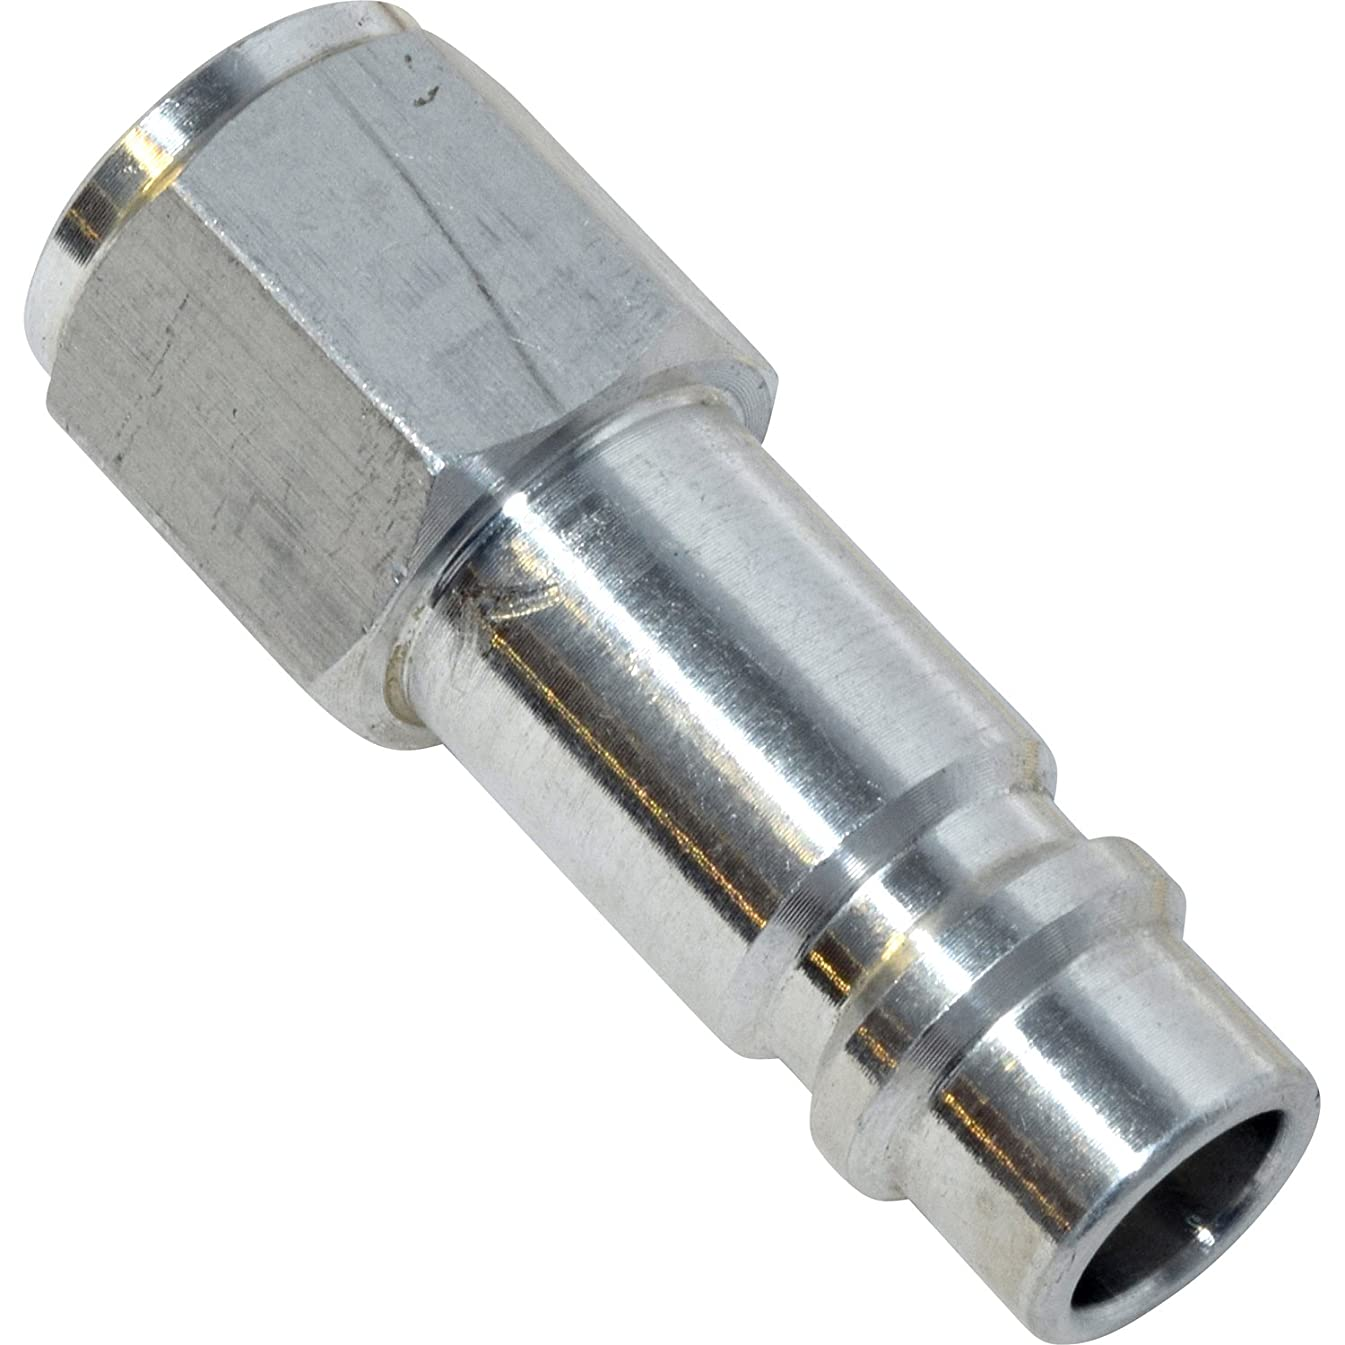 UAC Universal Air Conditioner to 0272C A/C Repair Tool